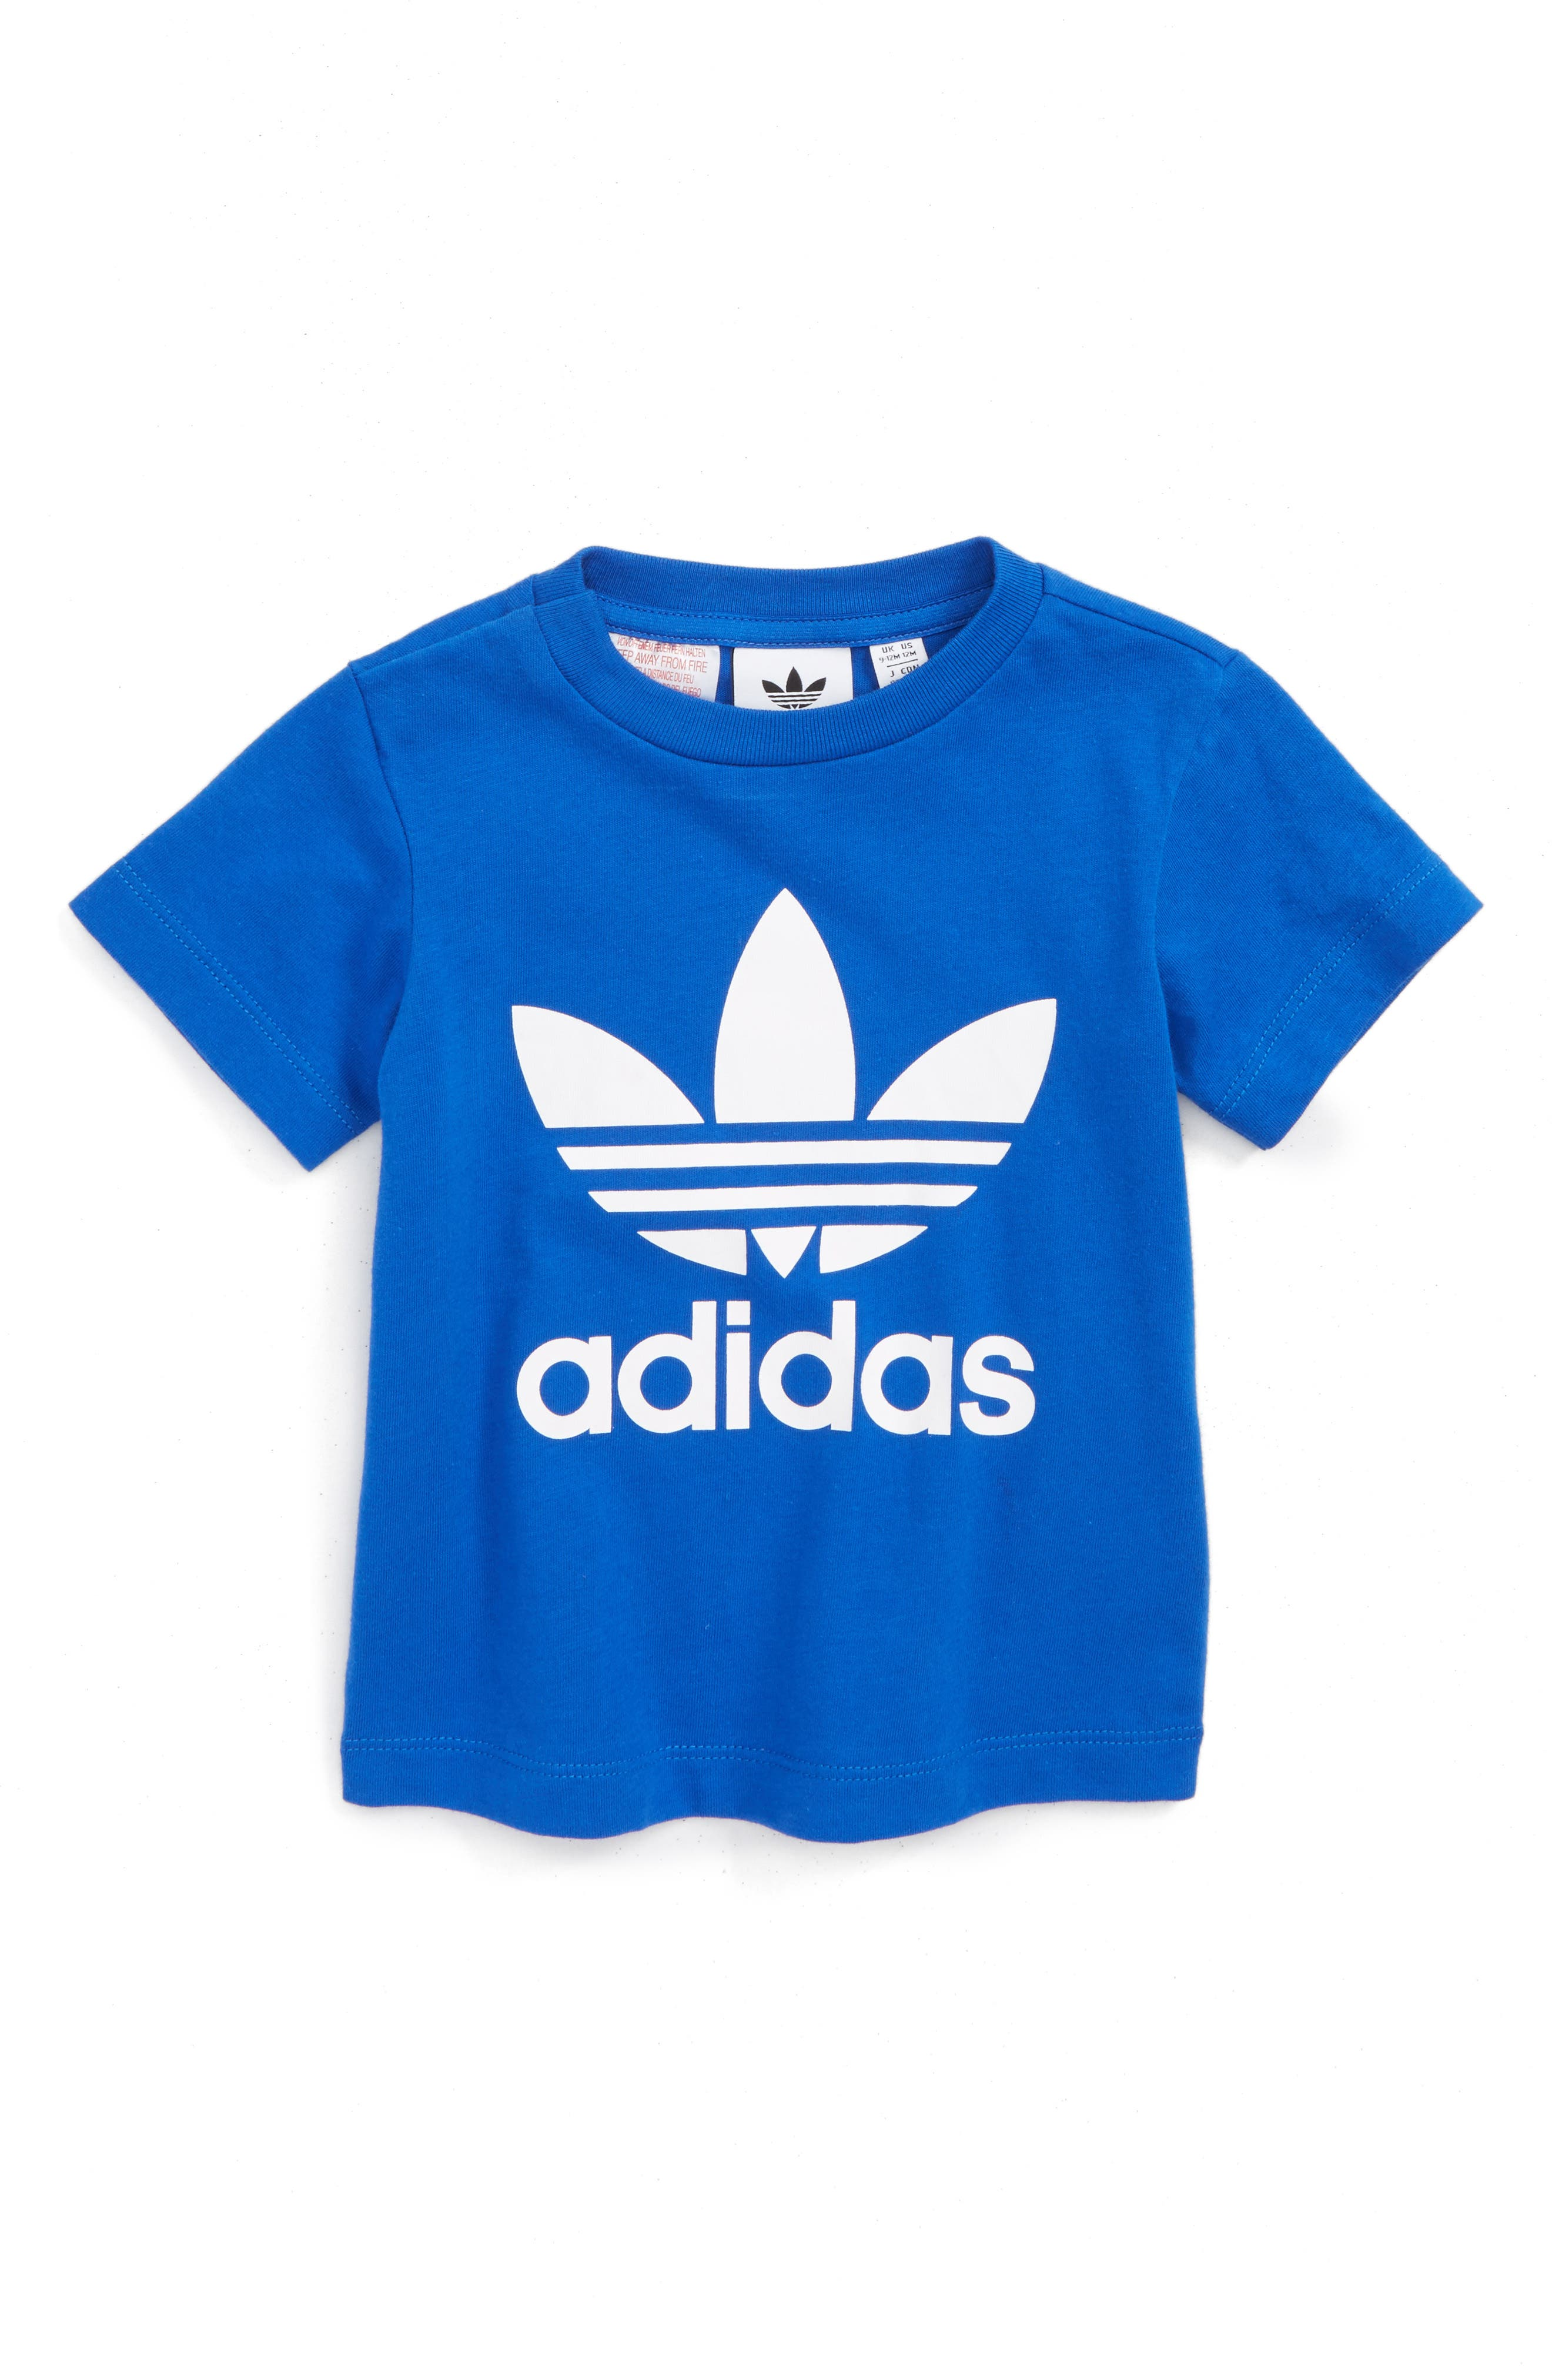 Originals Trefoil Logo T-Shirt,                         Main,                         color, Blue. White